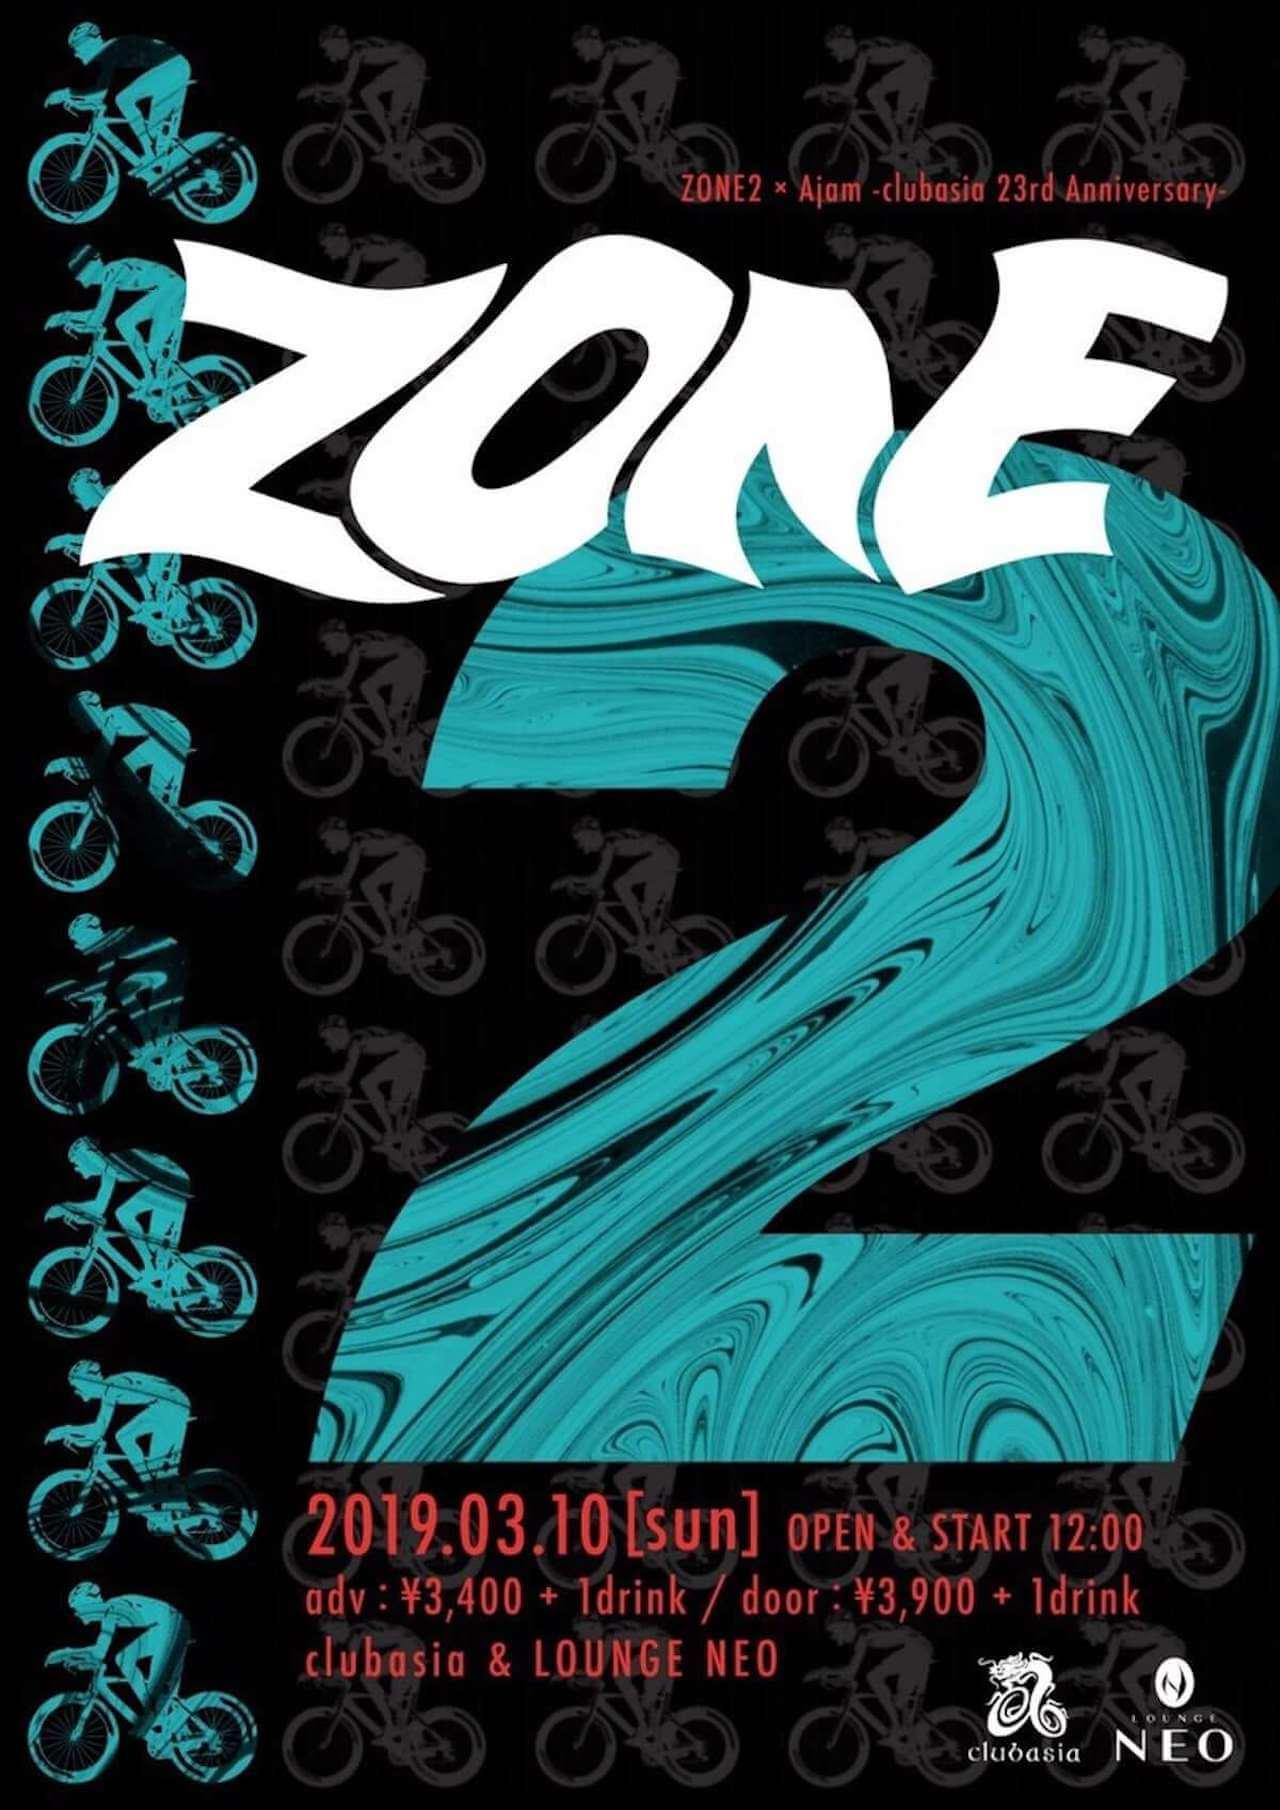 ZONE鼎談|新世代の誕生、6バンド+DJが作る新たなインディシーン interview-zone2-02